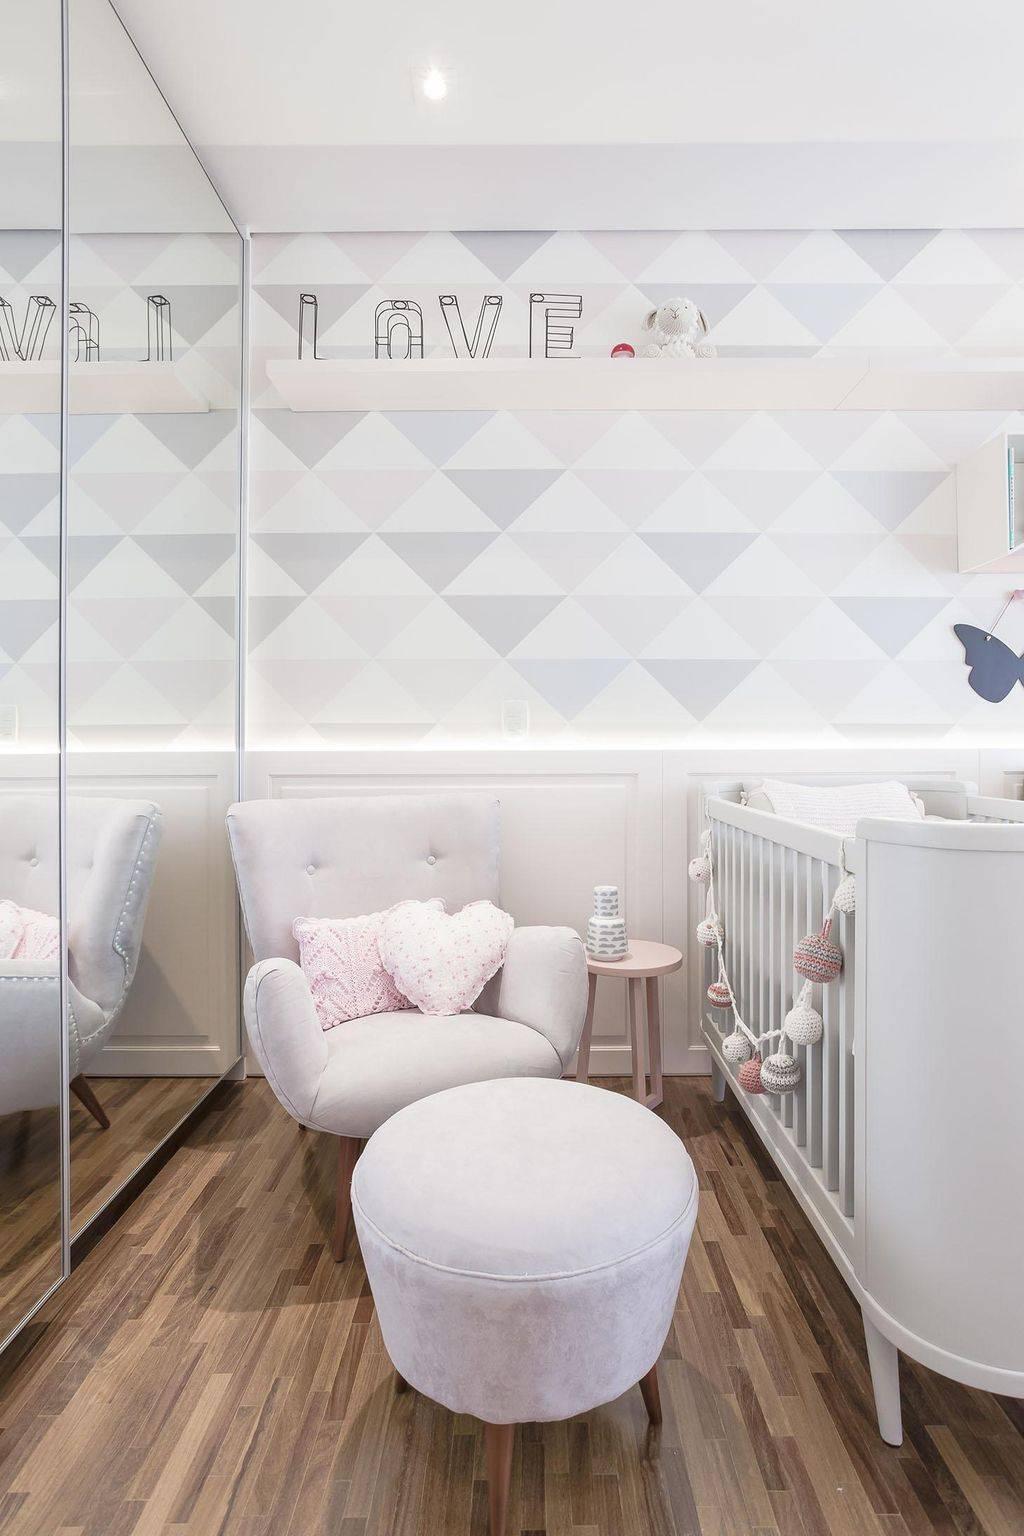 lampadas de led quarto de bebe figueiredo fischer 125469